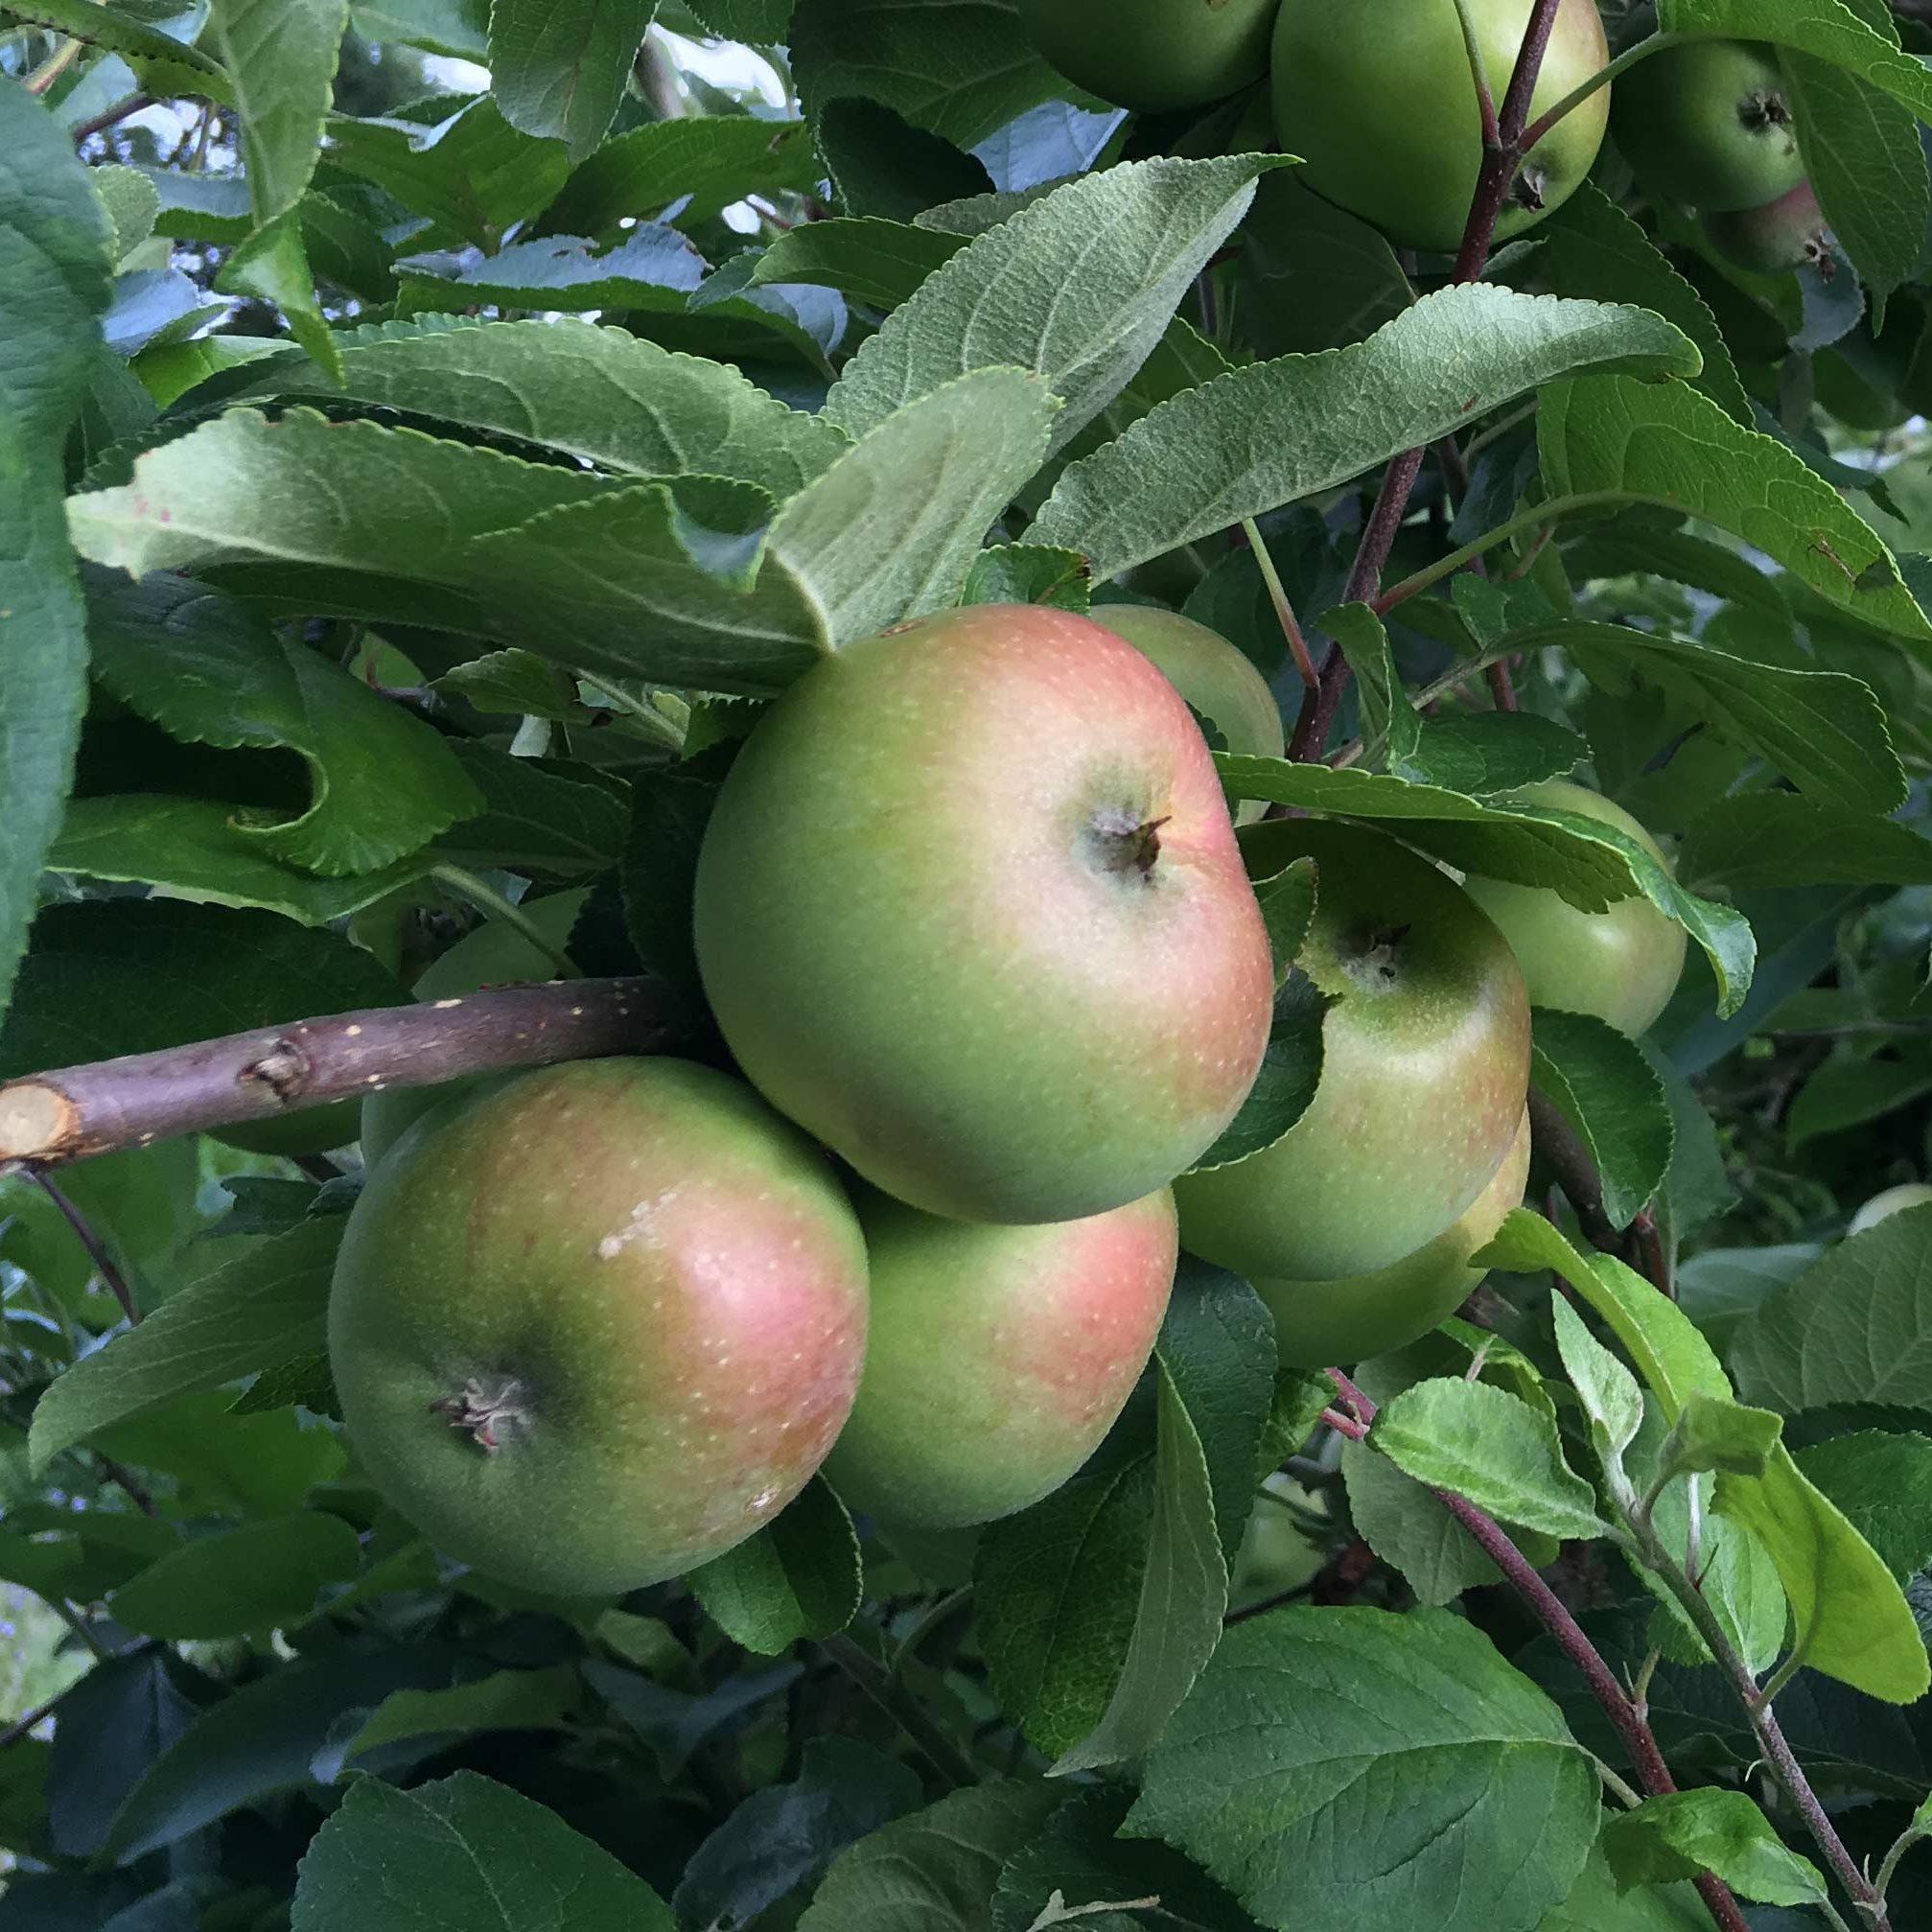 Obstbäume benötigen regelmäßige Pflege und Rückschnitt